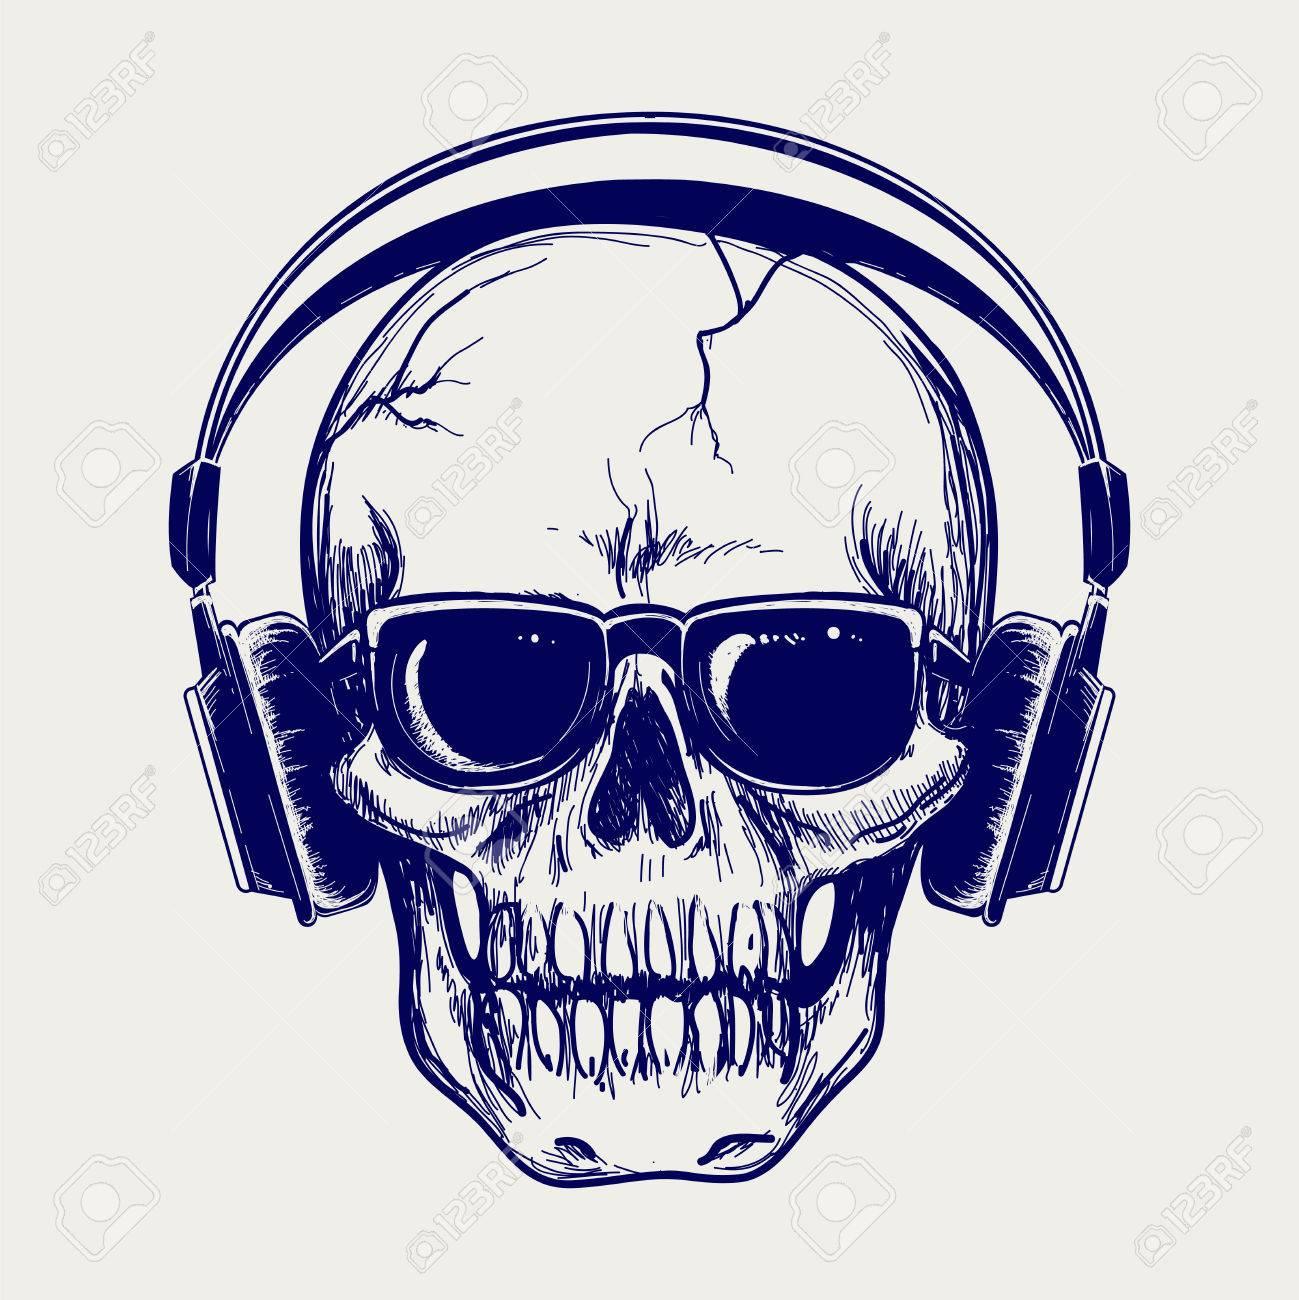 Drawing ball pen skull sketch with headphones vector